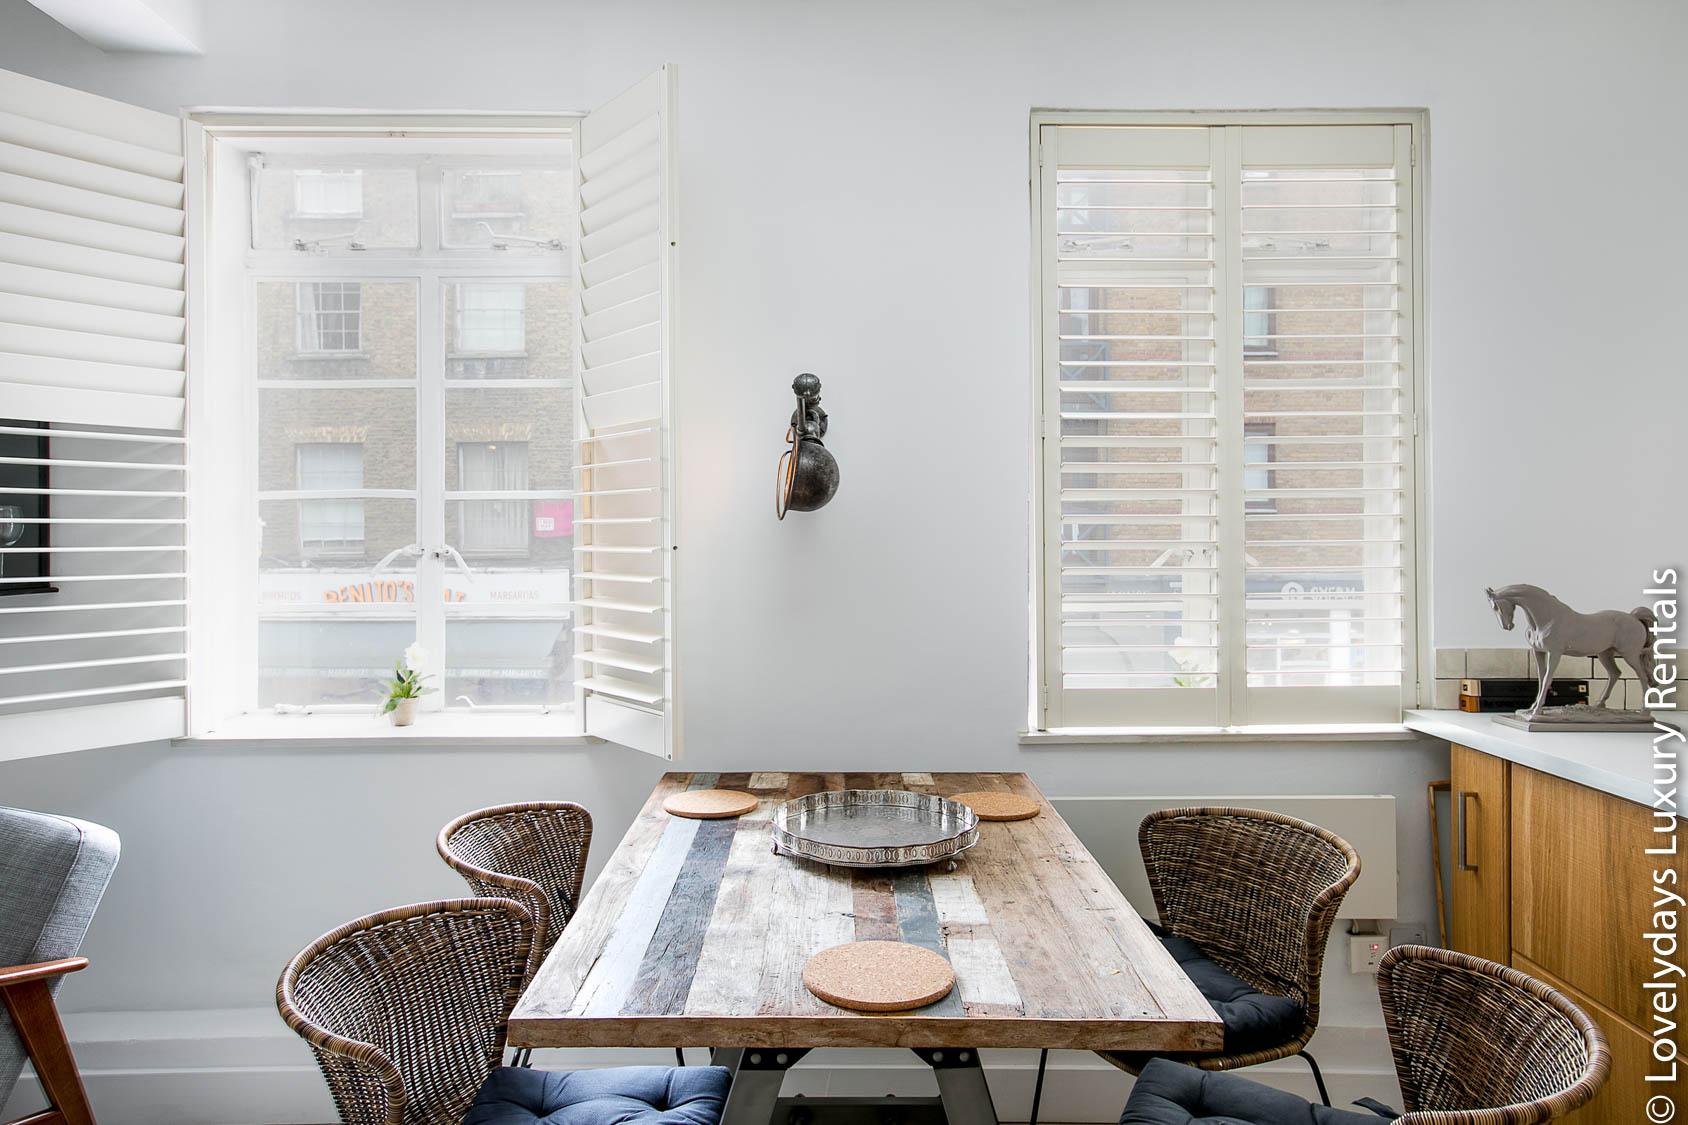 Lovelydays luxury service apartment rental - London - Fitzrovia - Goodge 55 - Lovelysuite - 2 bedrooms - 3 bathrooms - Dining living room - c4a36a21f1fa - Lovelydays